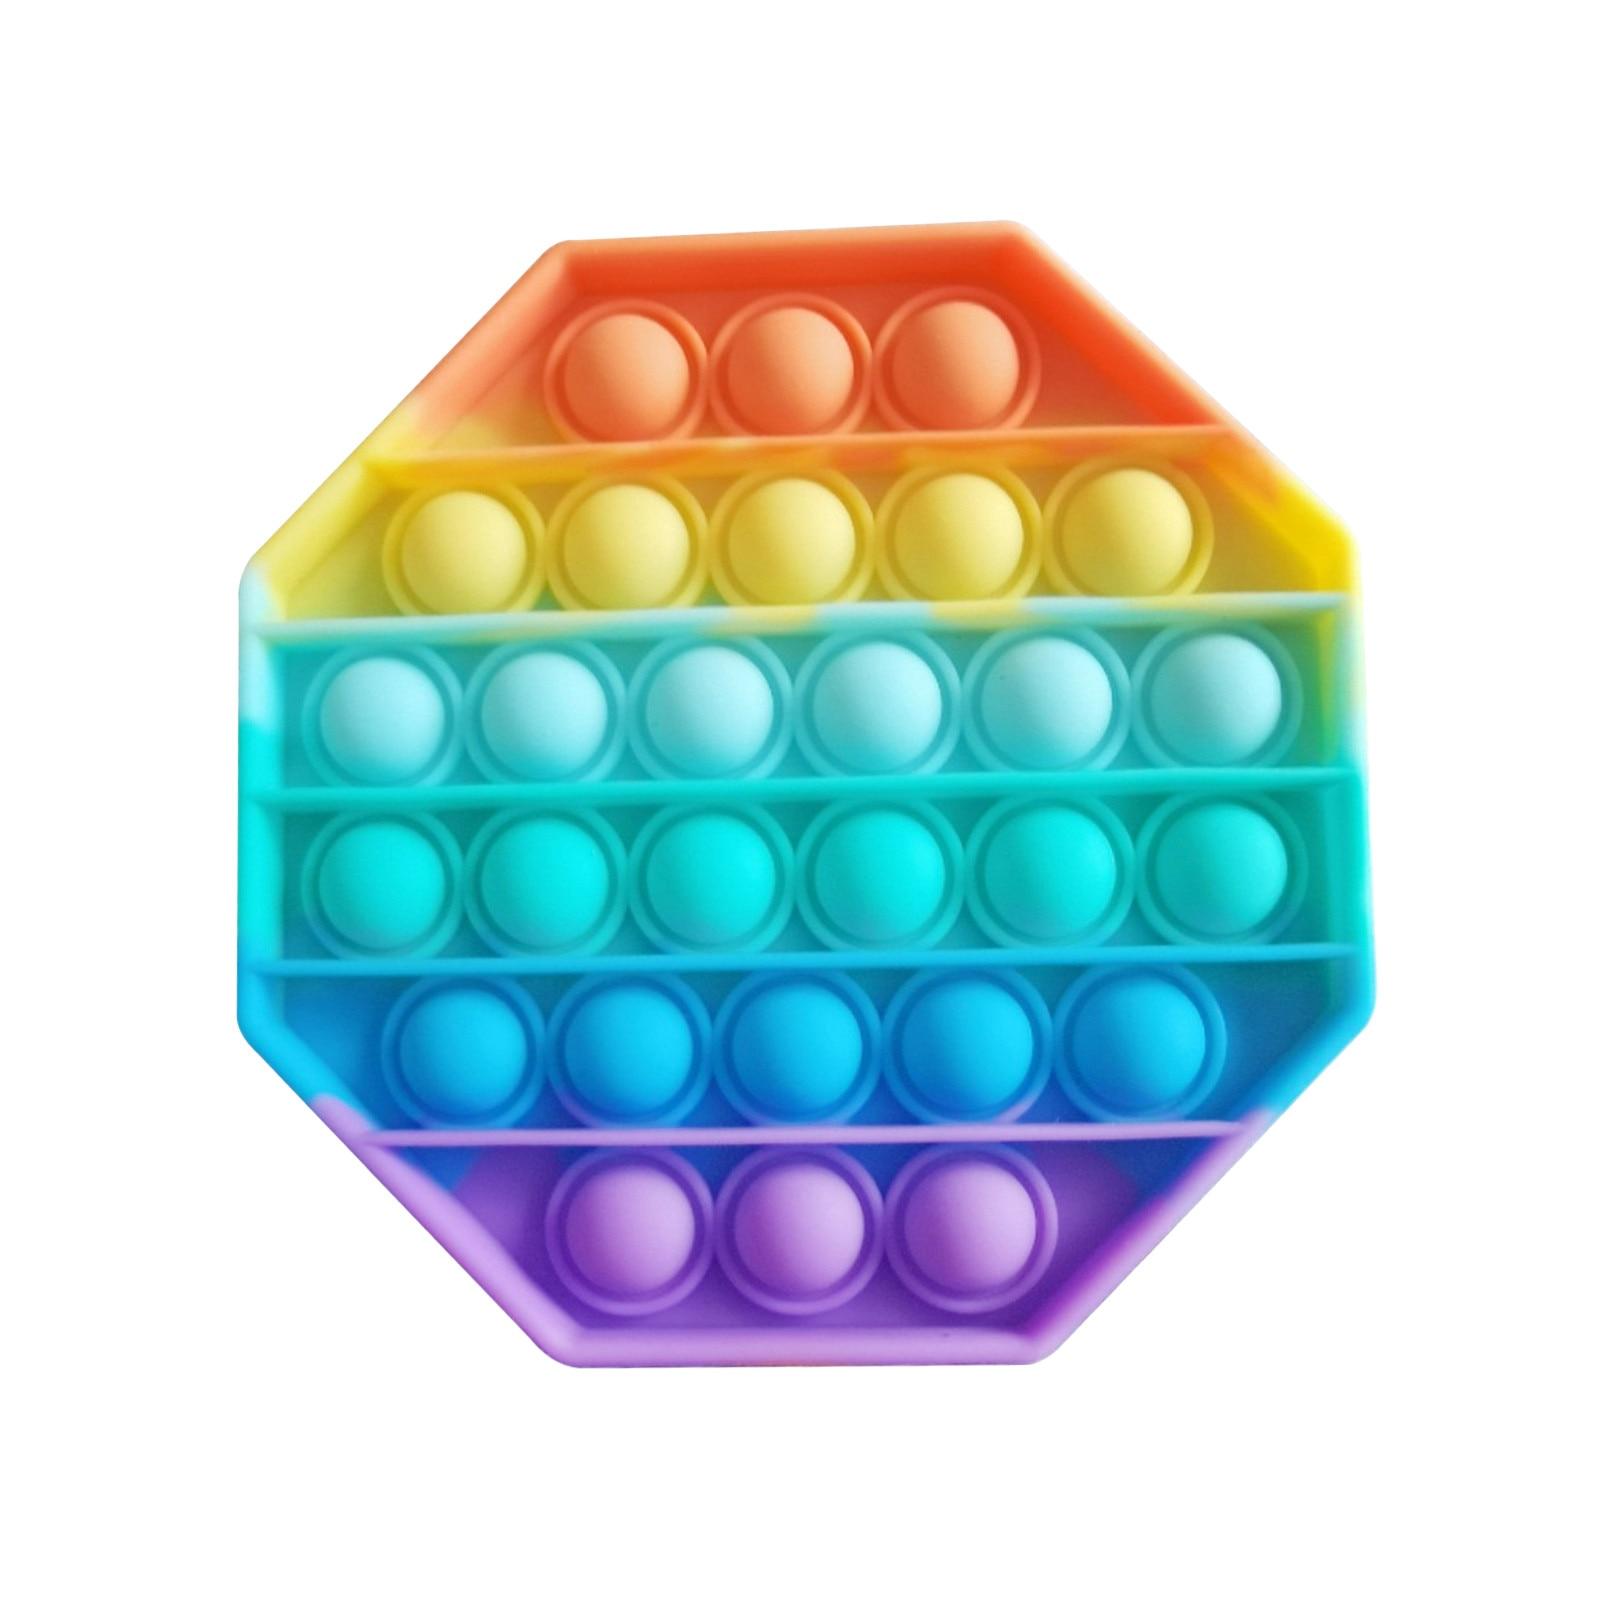 Adult Toys Autism Fidget Bubble-Sensory Anti-Stress Squishy Pop-It Push-Pops Needs Rainbow img5